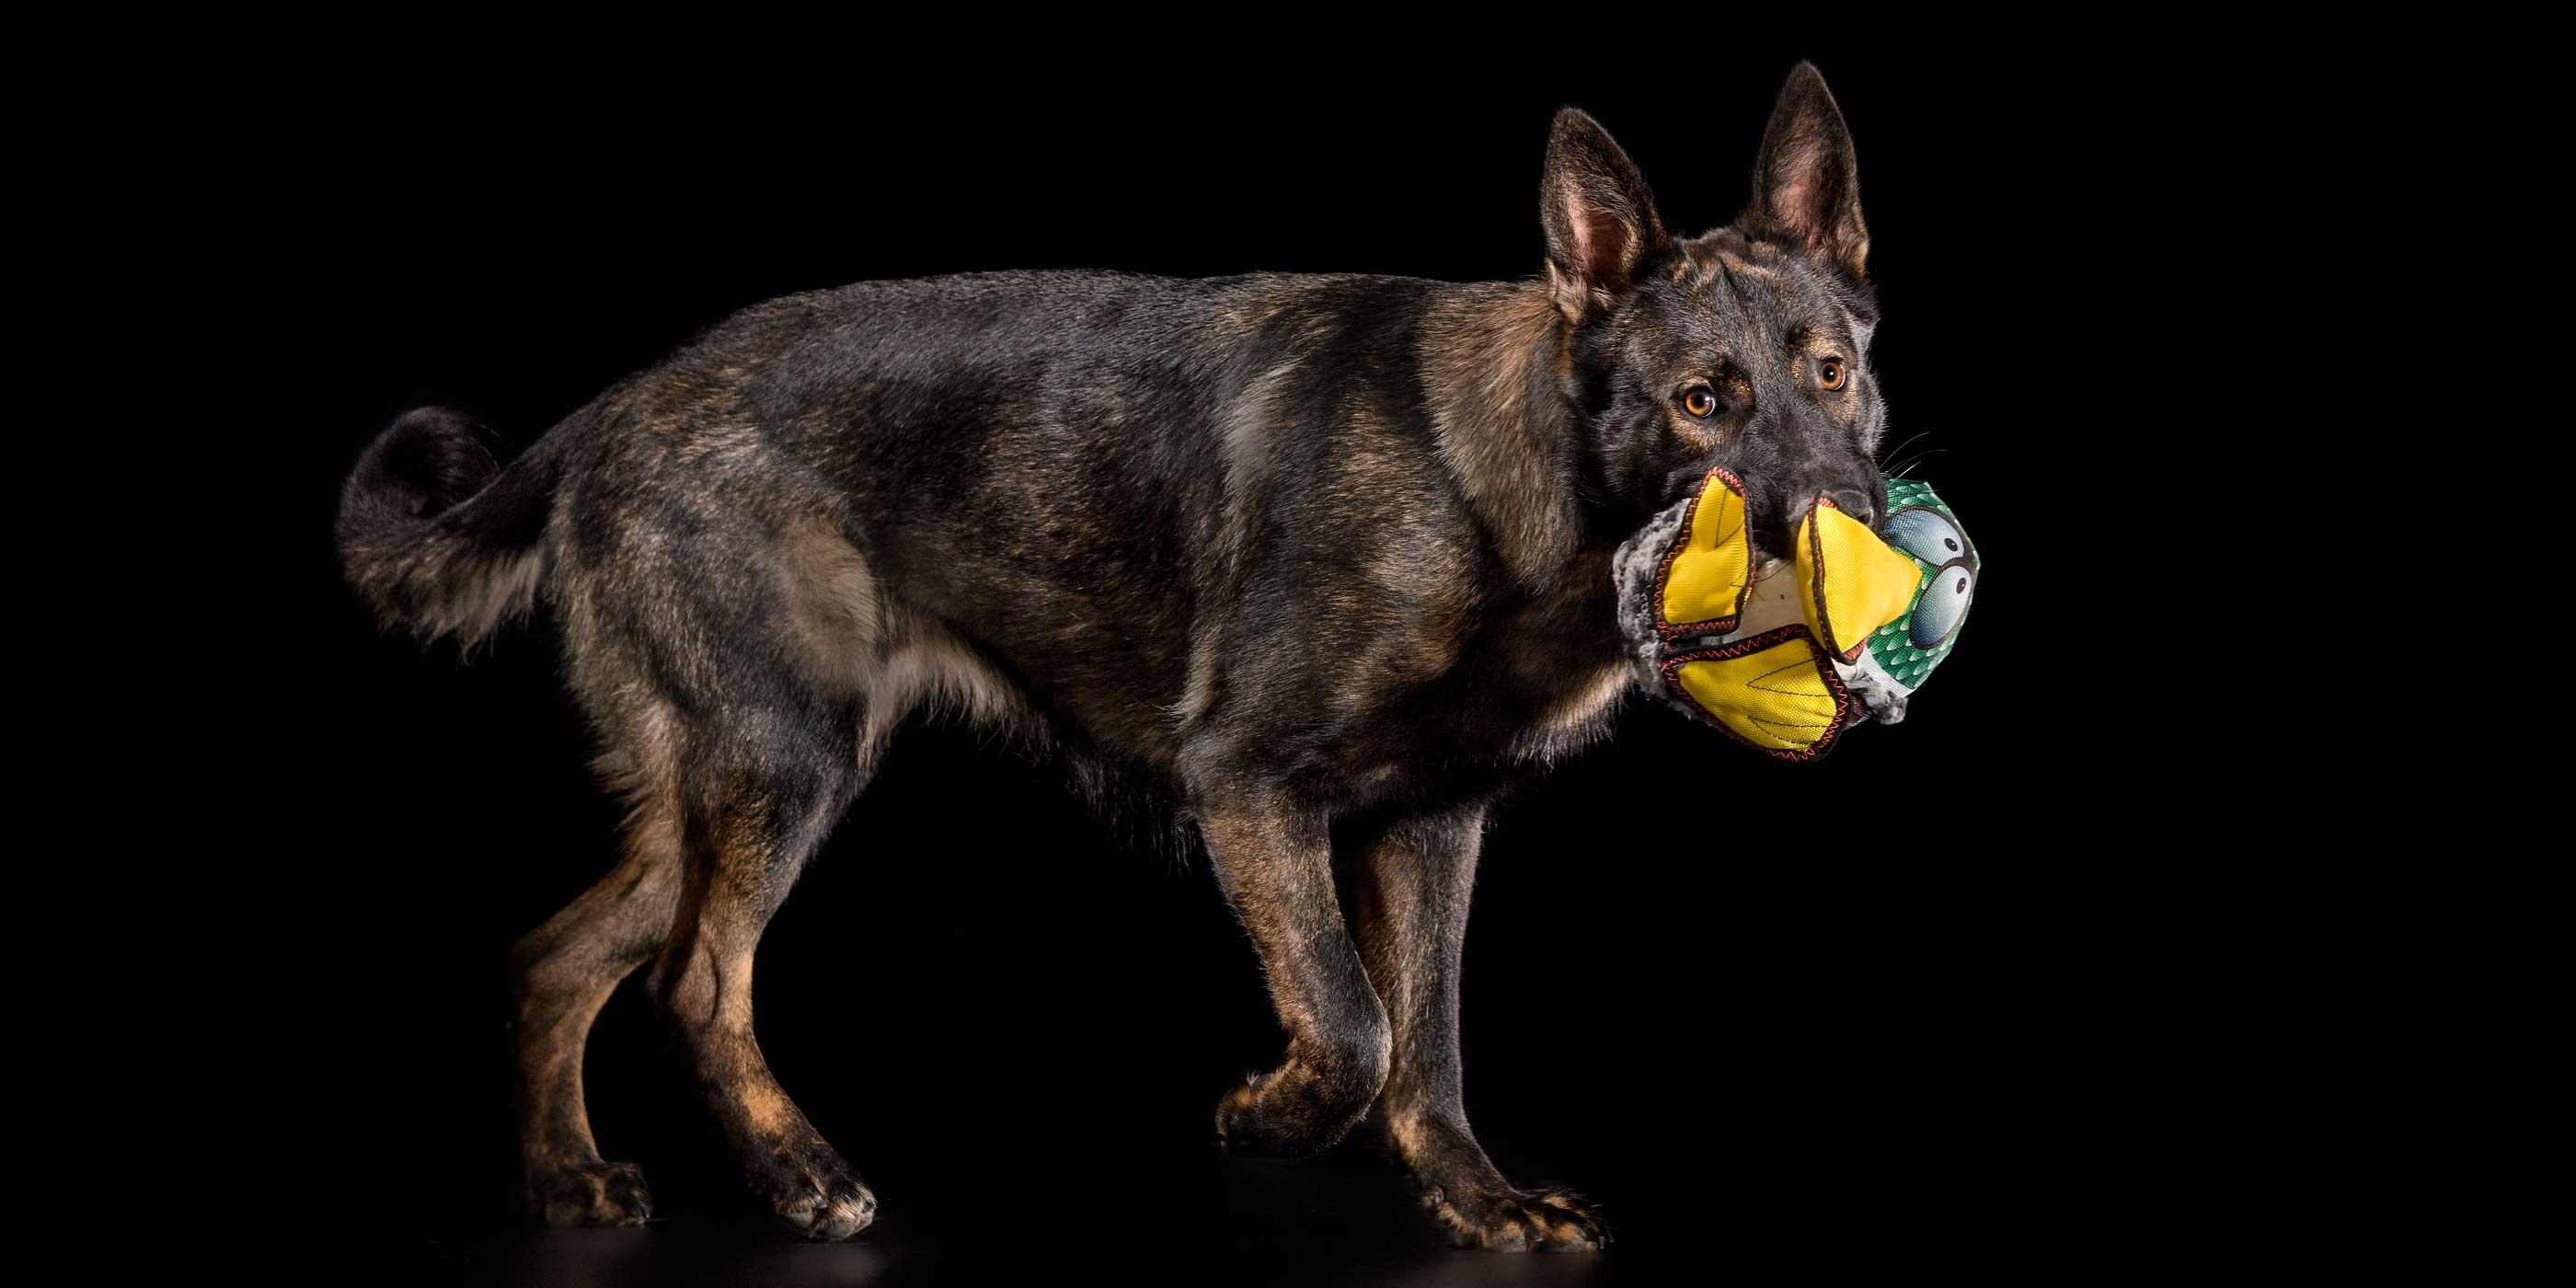 german shepherd walking with stuffed toy in mouth